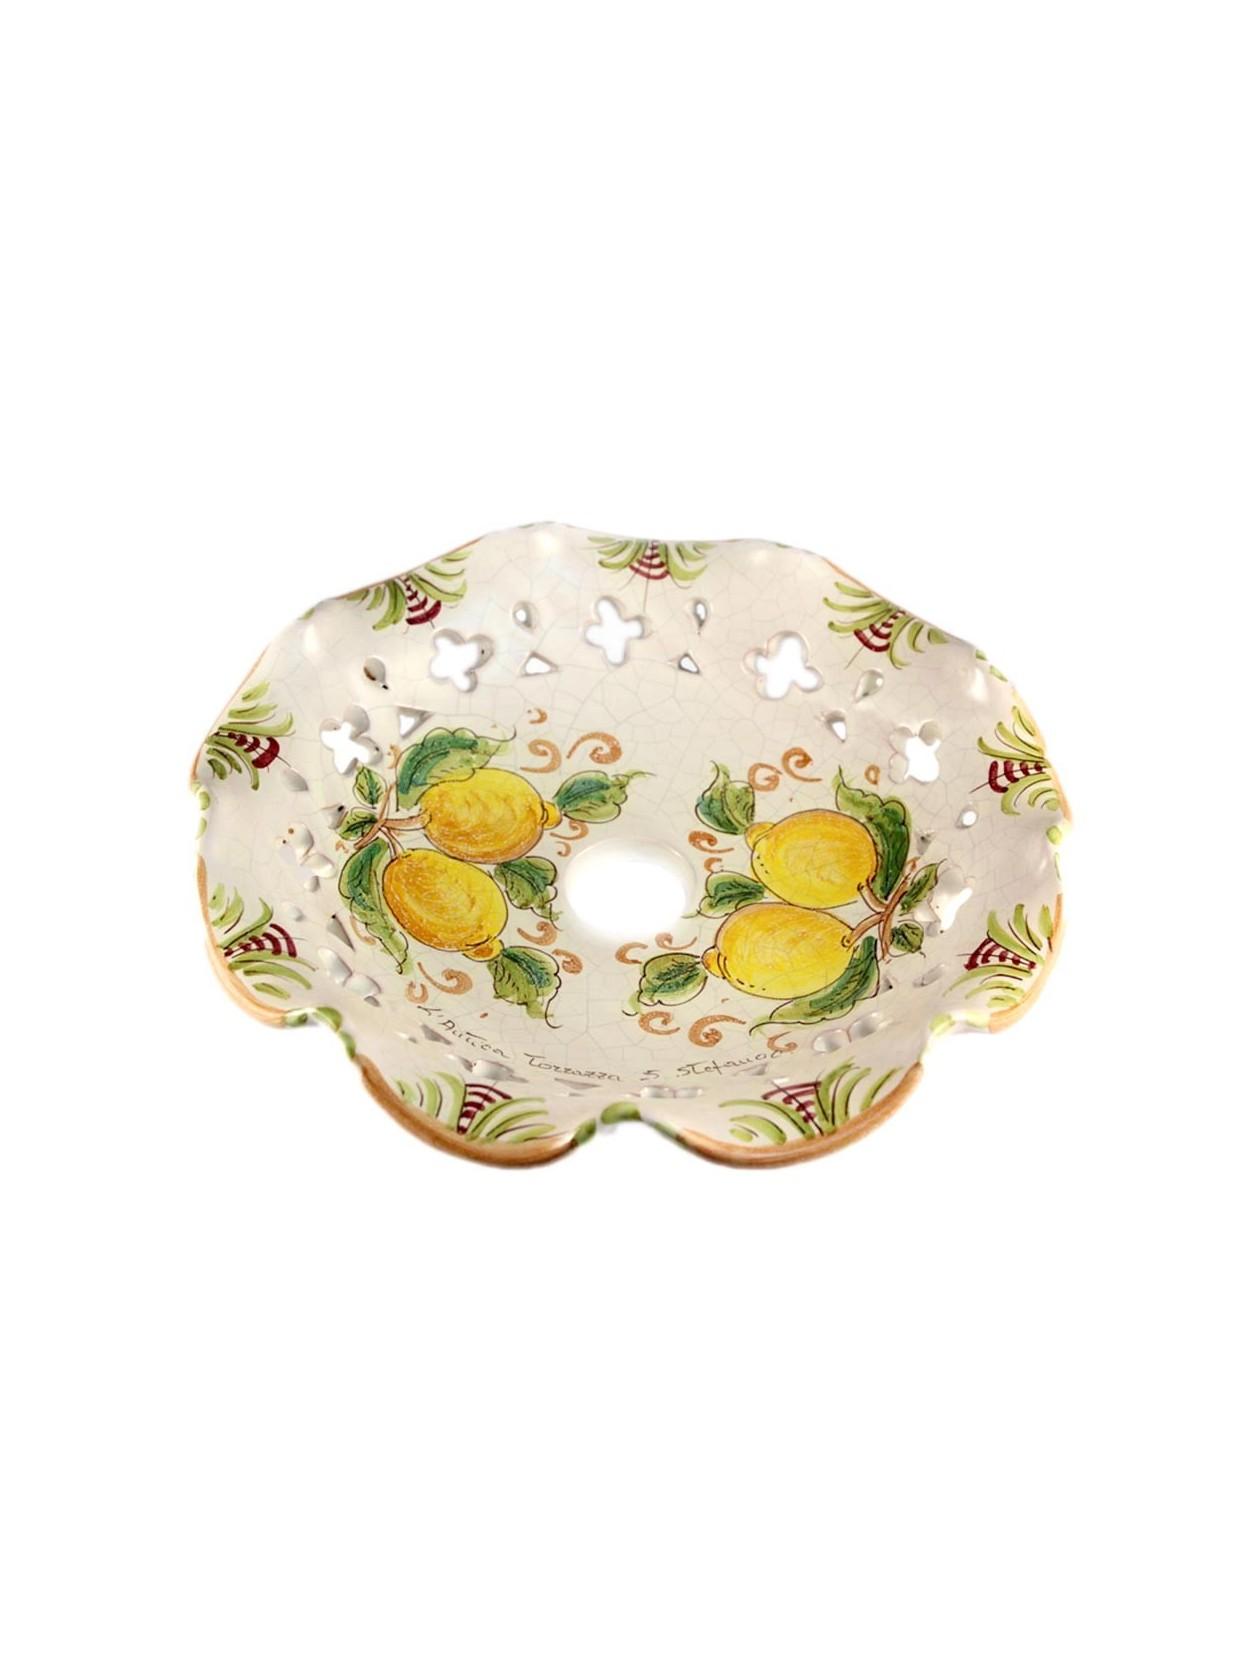 Piatti In Ceramica Per Lampadari.Dettagli Su Piatto Per Lampadario Ceramica Siciliana Decoro Limoni D 30